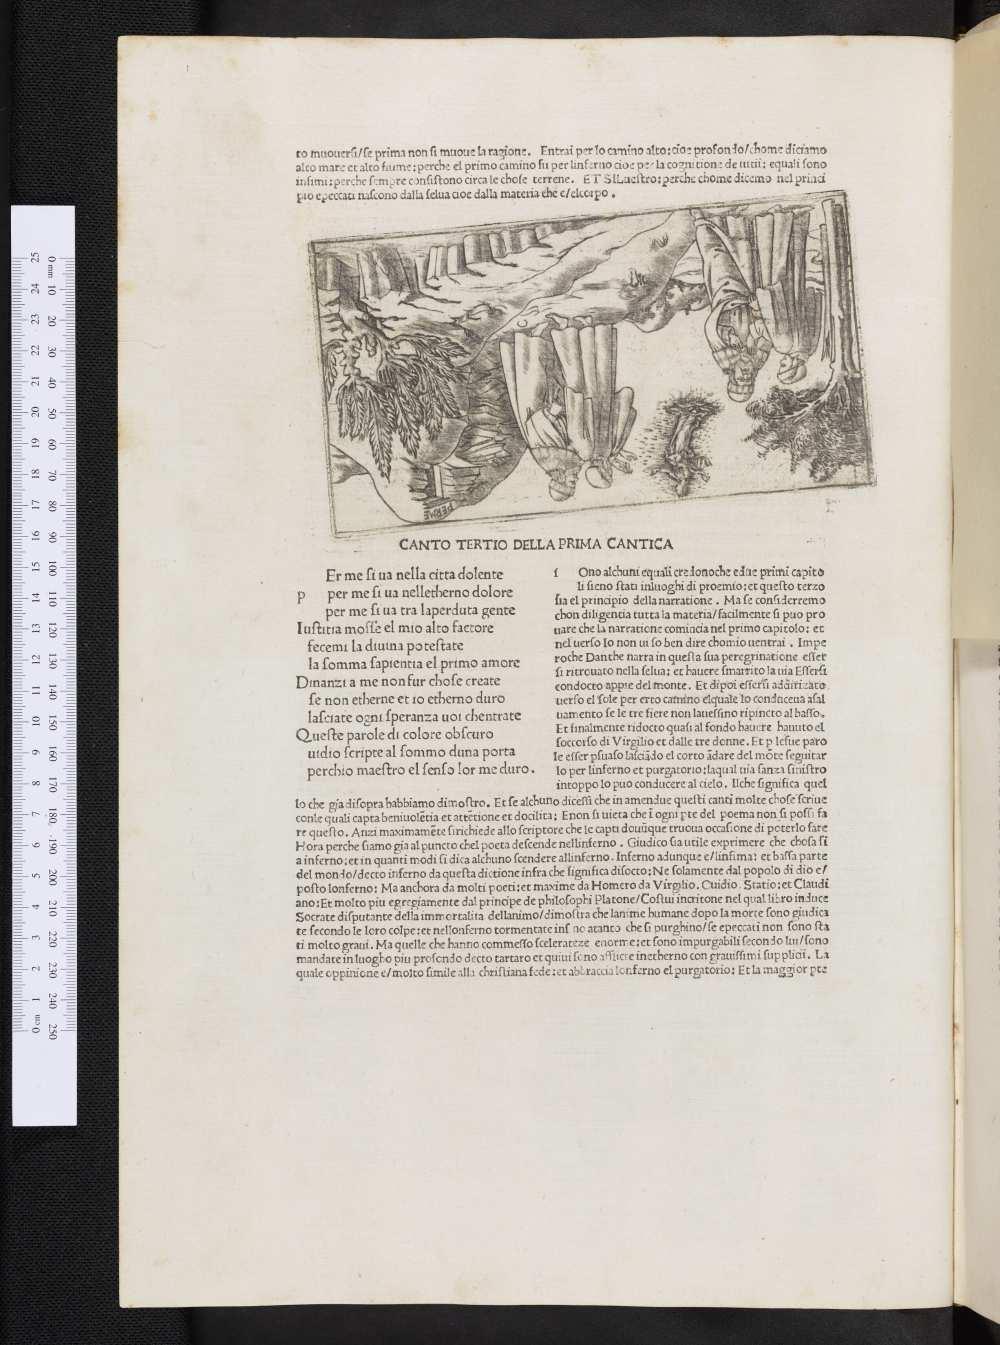 Bodleian Library Auct. 2Q 1.11. A kép forrása: Bodleian Libraries, University of Oxford https://digital.bodleian.ox.ac.uk/objects/1ba80701-8b5b-4fc9-9252-b6101c99e791/surfaces/3b98e06a-9e6f-4f0a-8a1c-3e135ab5f66e/